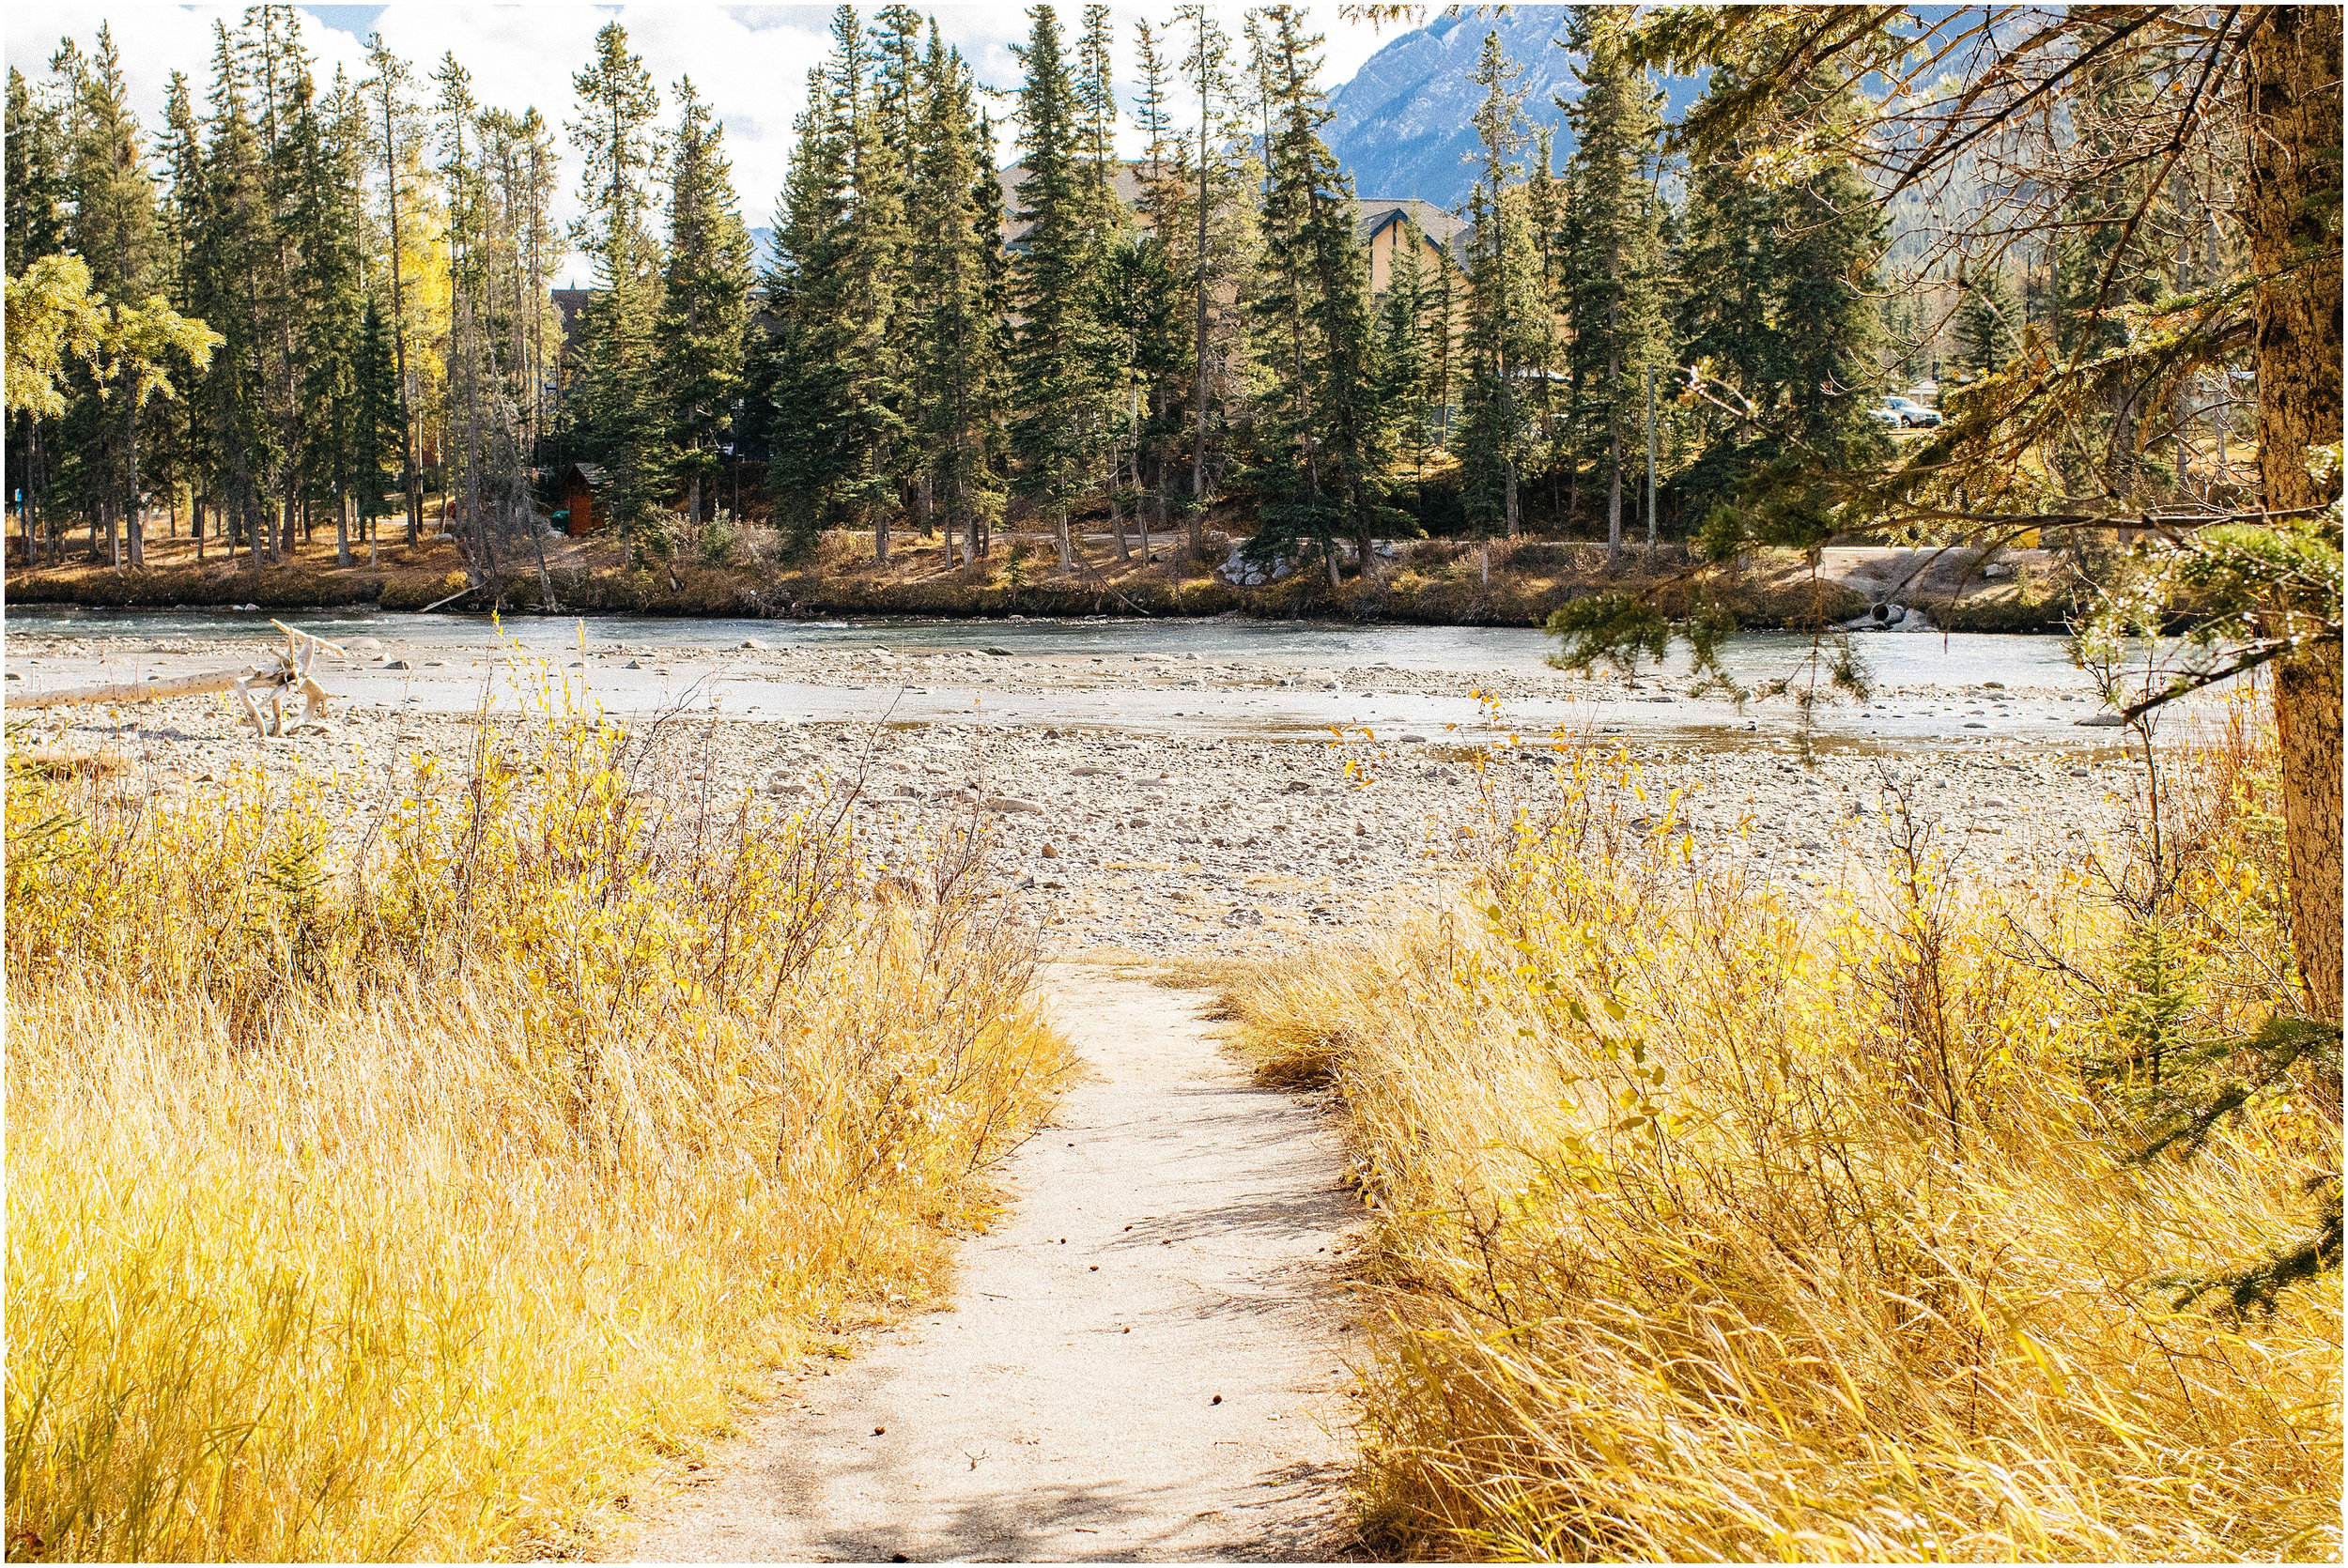 Banff_Travel_Photographer-90.jpg